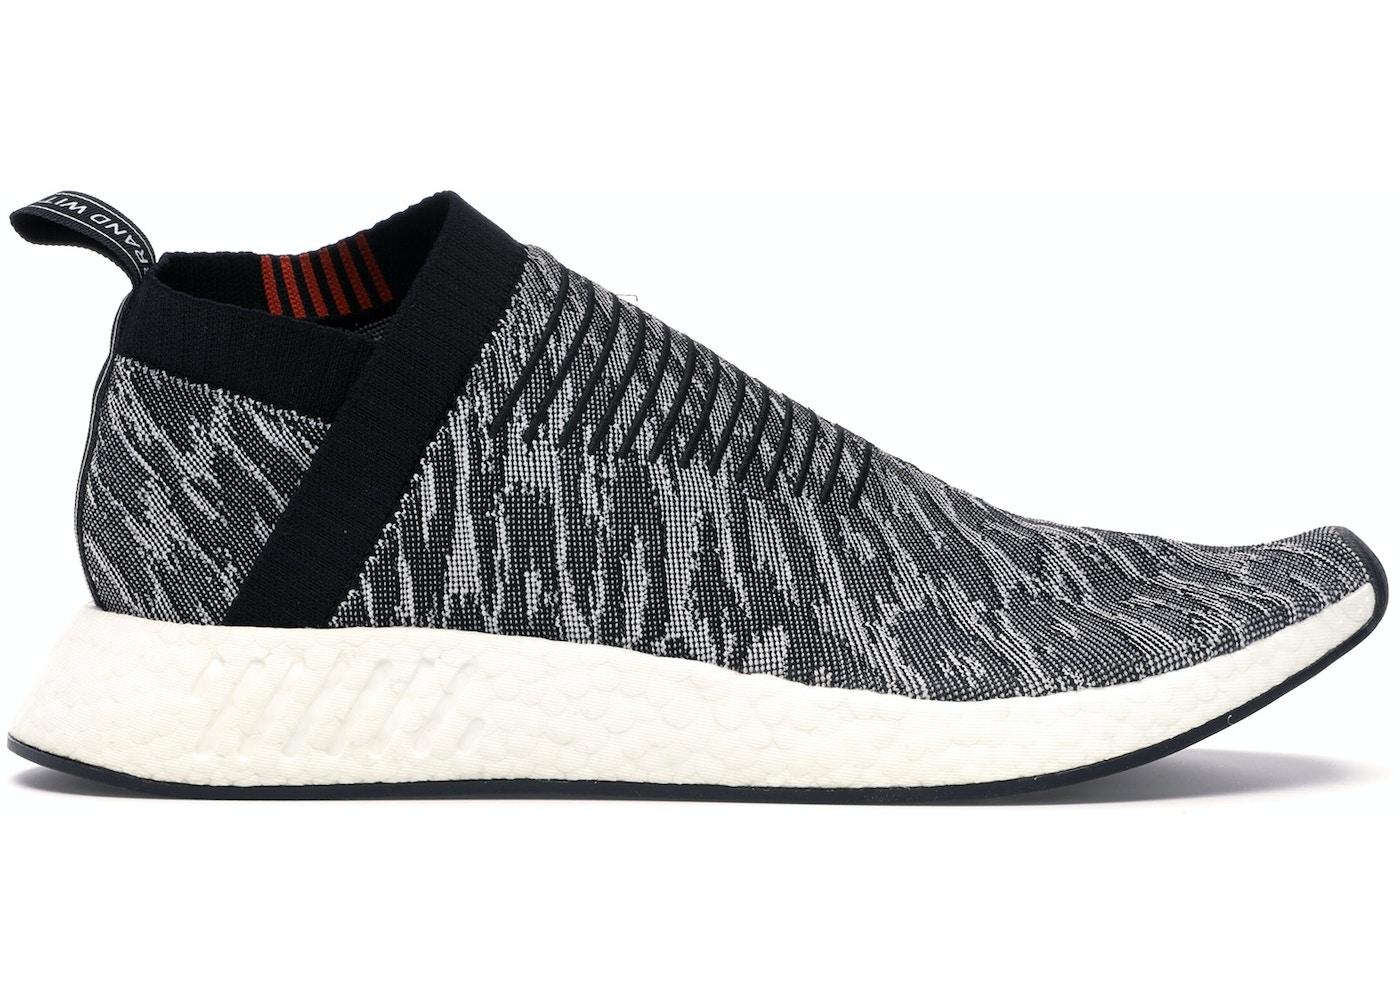 Adidas Nmd Cs2 Glitch Black Red White Bz0515